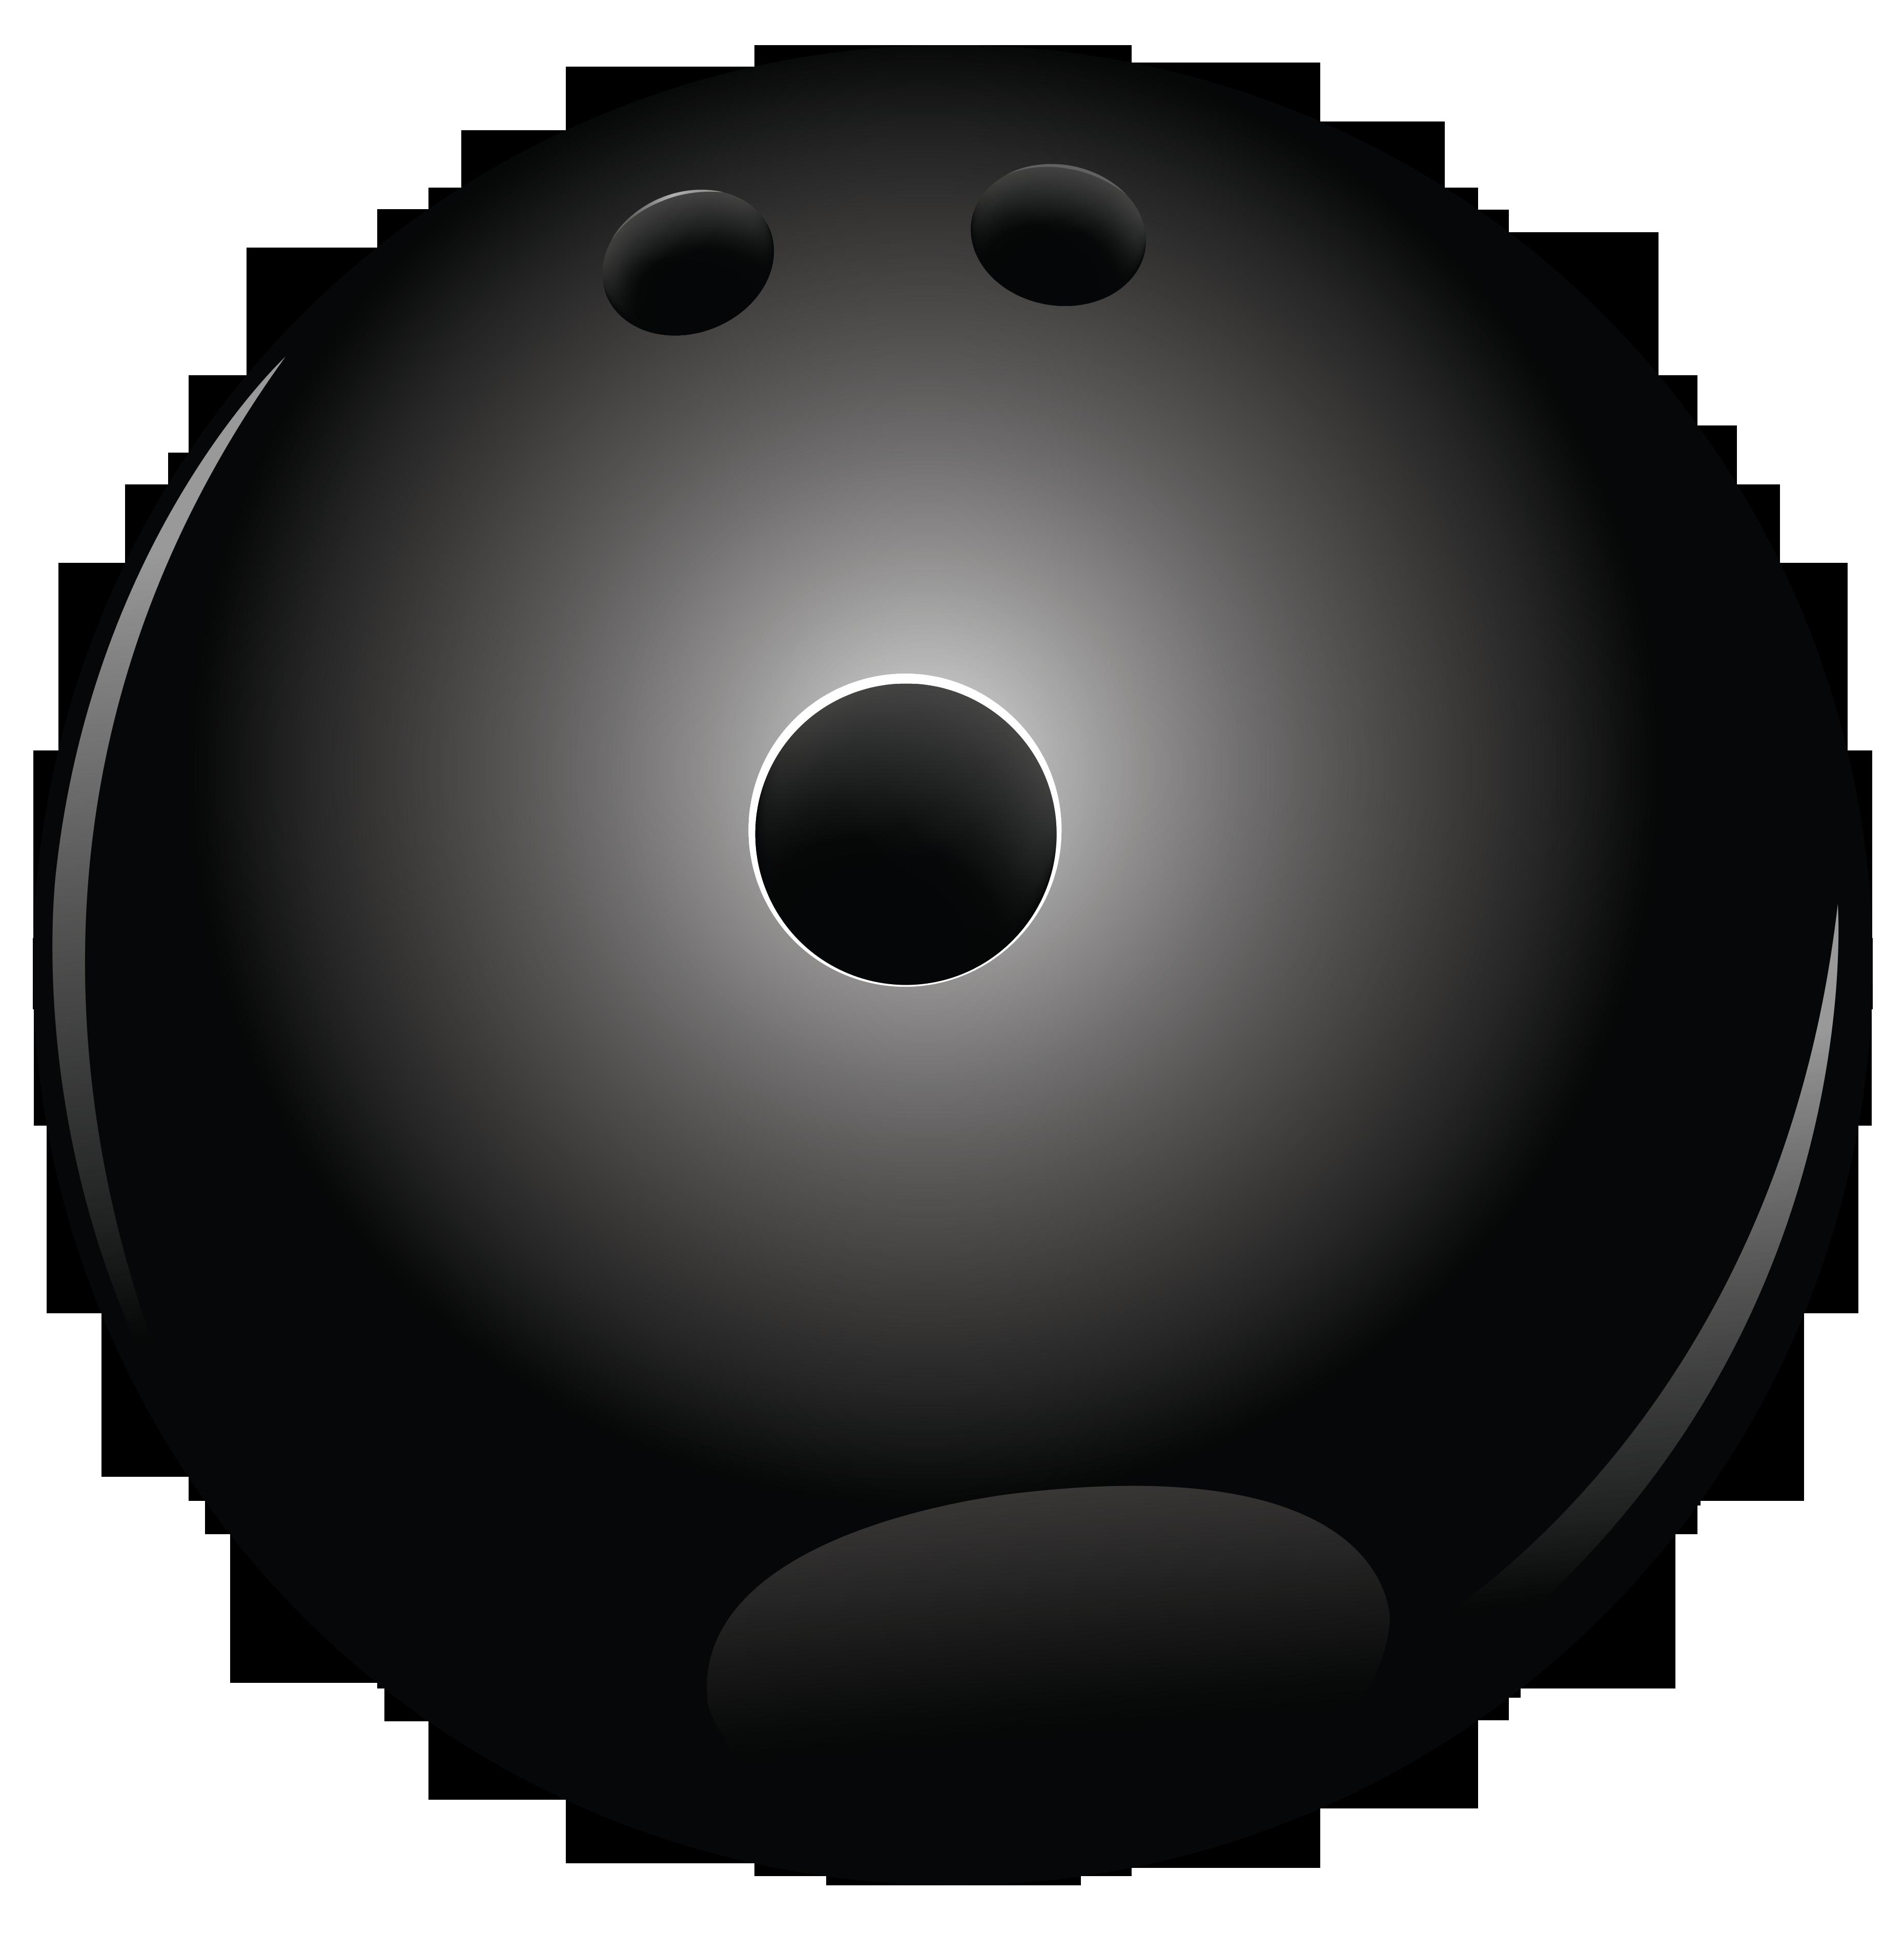 Bowling Ball In 2021 Bowling Ball Bowling Ball